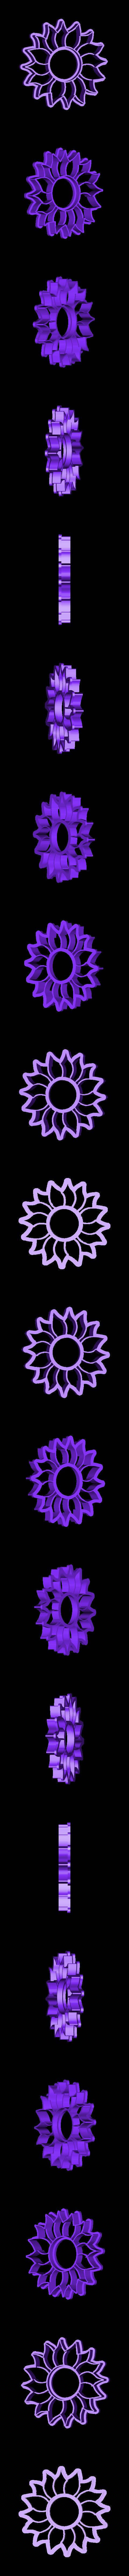 Cortante Flor Sol.stl Download STL file Sunflower Cookie Cutter, Sunflower cookie cutter • Model to 3D print, abauerenator